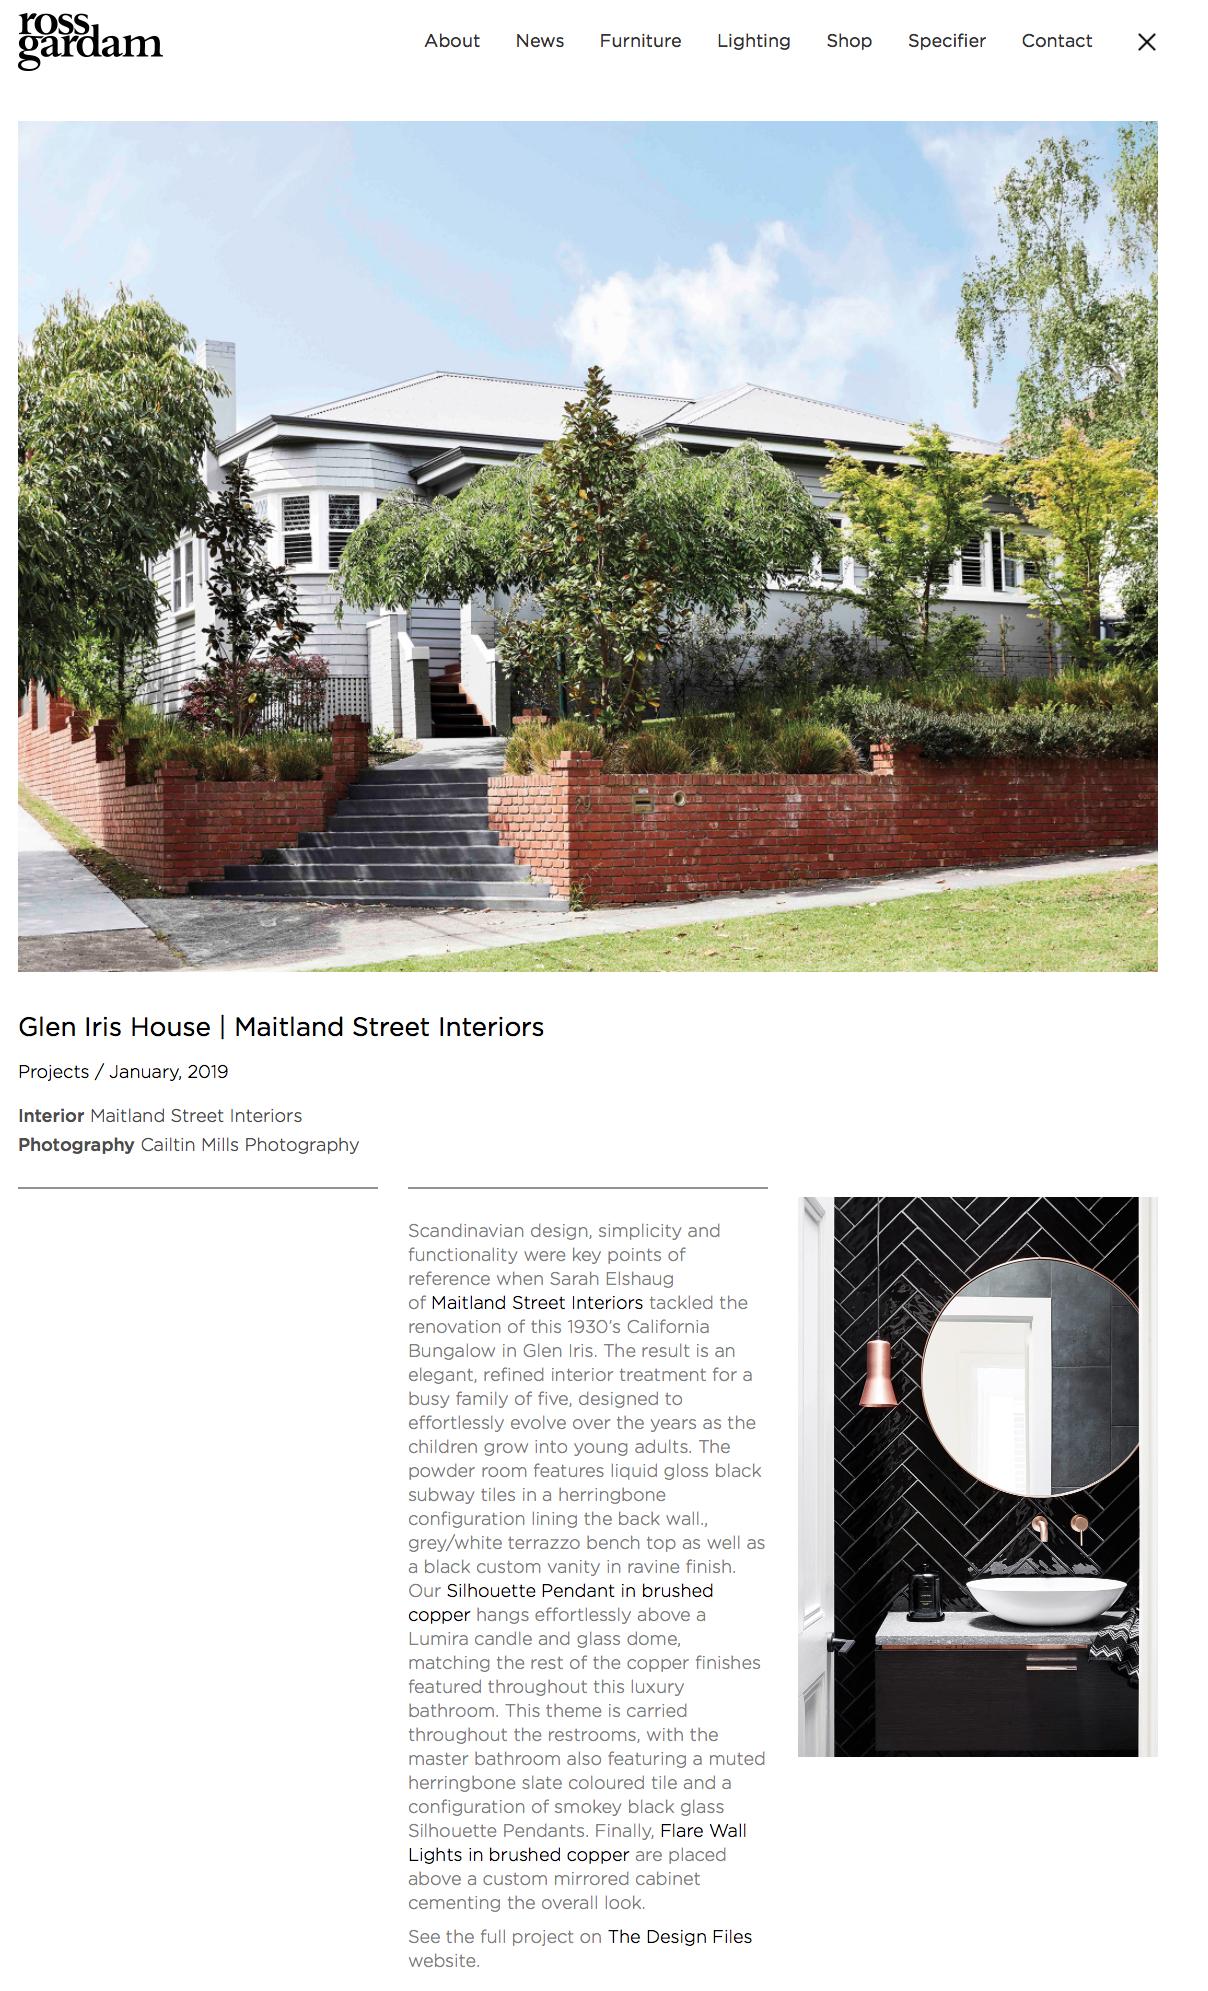 Sarah Elshaug, Maitland Street Interiors, Ross Gardam Lighting, Interior Decorator, Melbourne Interiors, Bathroom Design, Feature Lighting, Bathroom Lighting